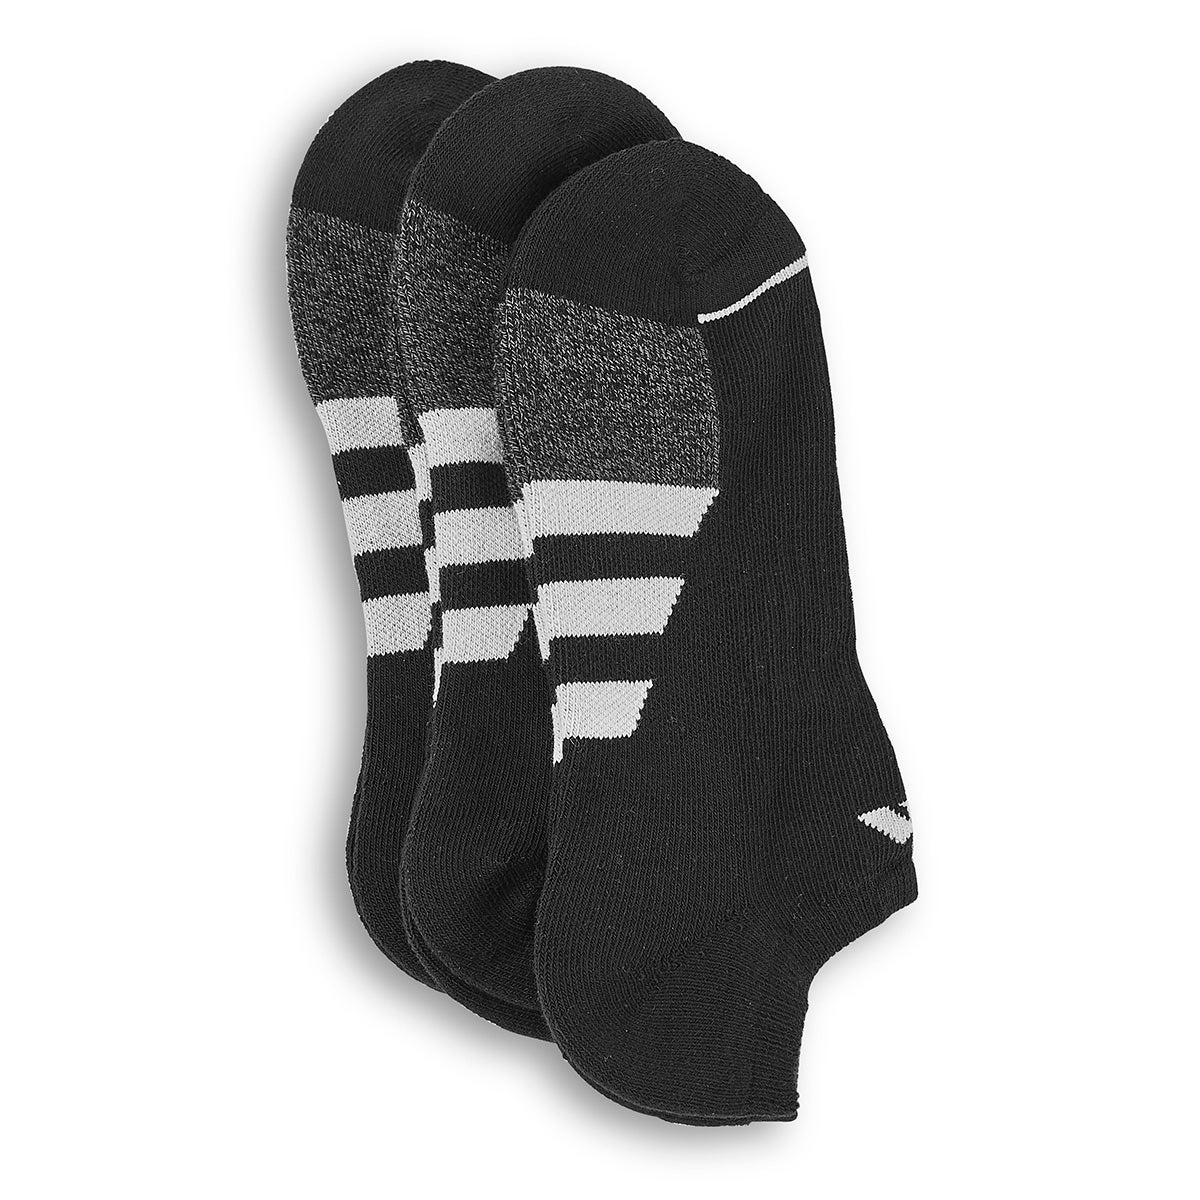 Men's CUSHIONED II black low cut socks -3pk